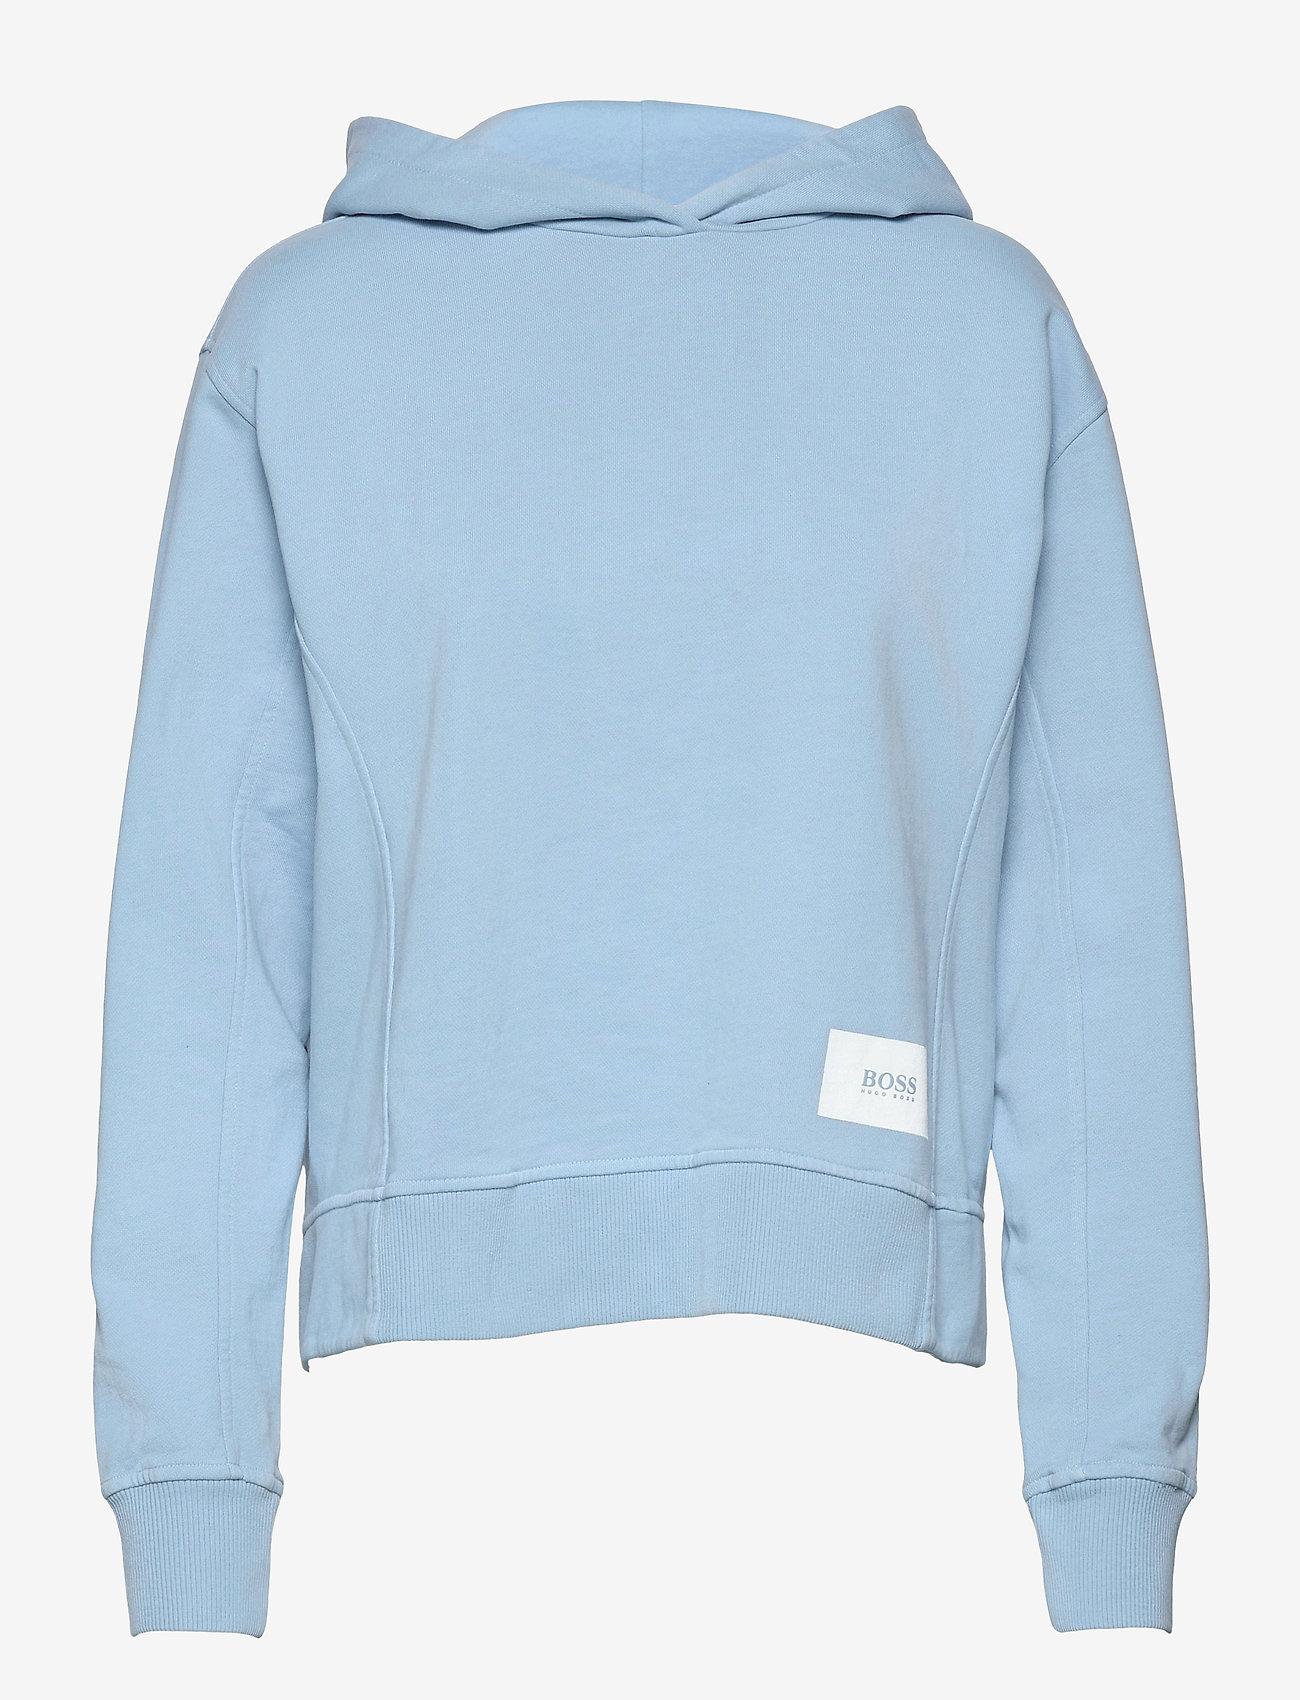 BOSS - Esqua - hættetrøjer - light/pastel blue - 0